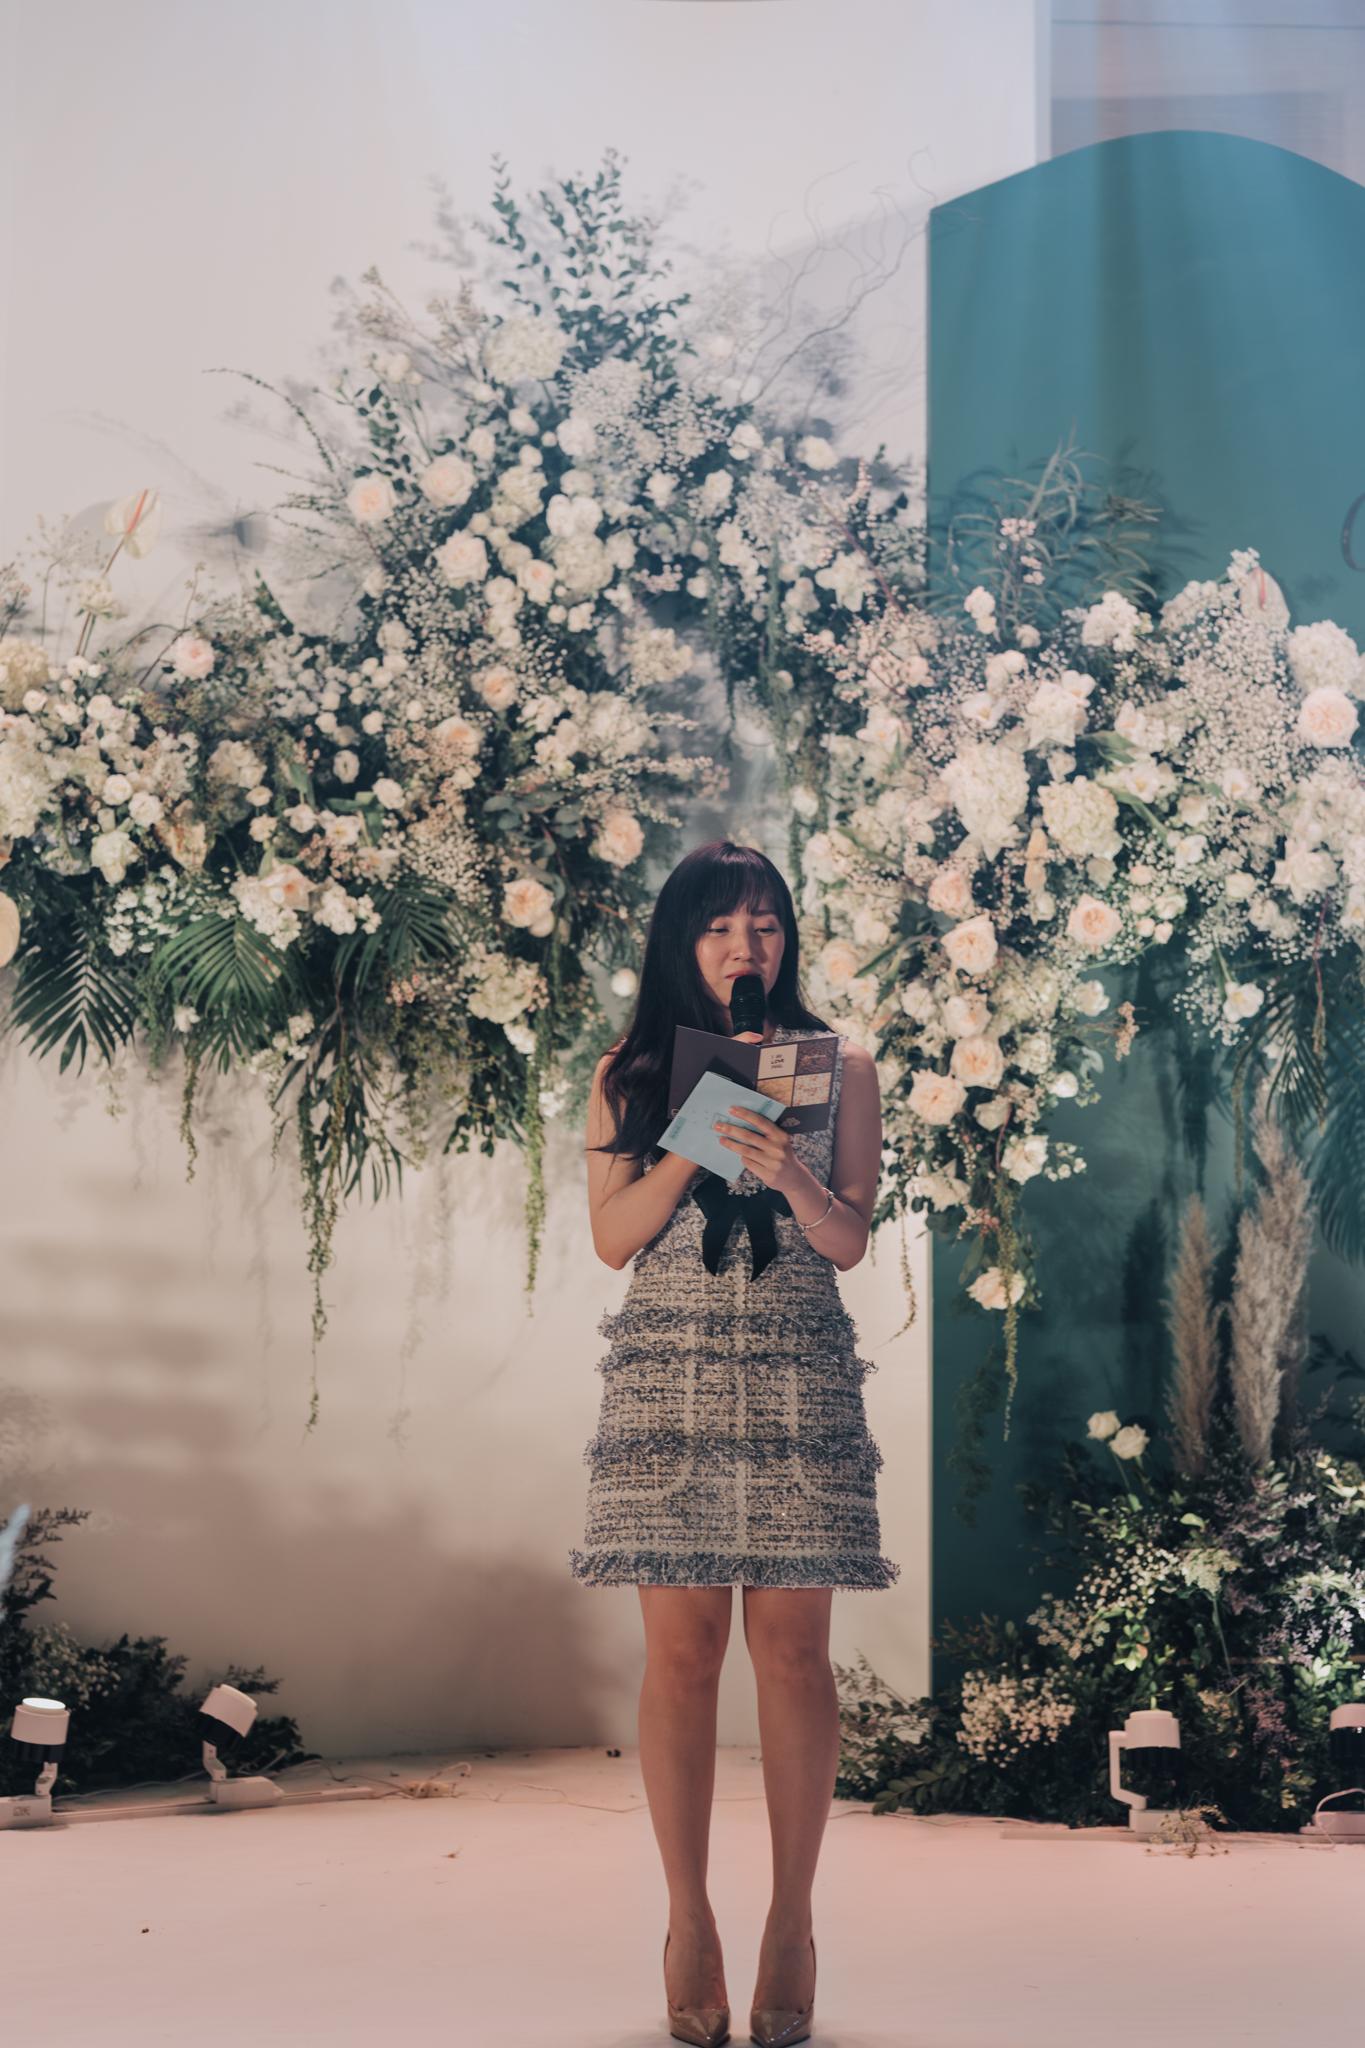 JWMarriott Ha Noi Intimate Wedding of Trang Hi well captured by Hipster Wedding Vietnam Wedding Photographer-97666.jpg